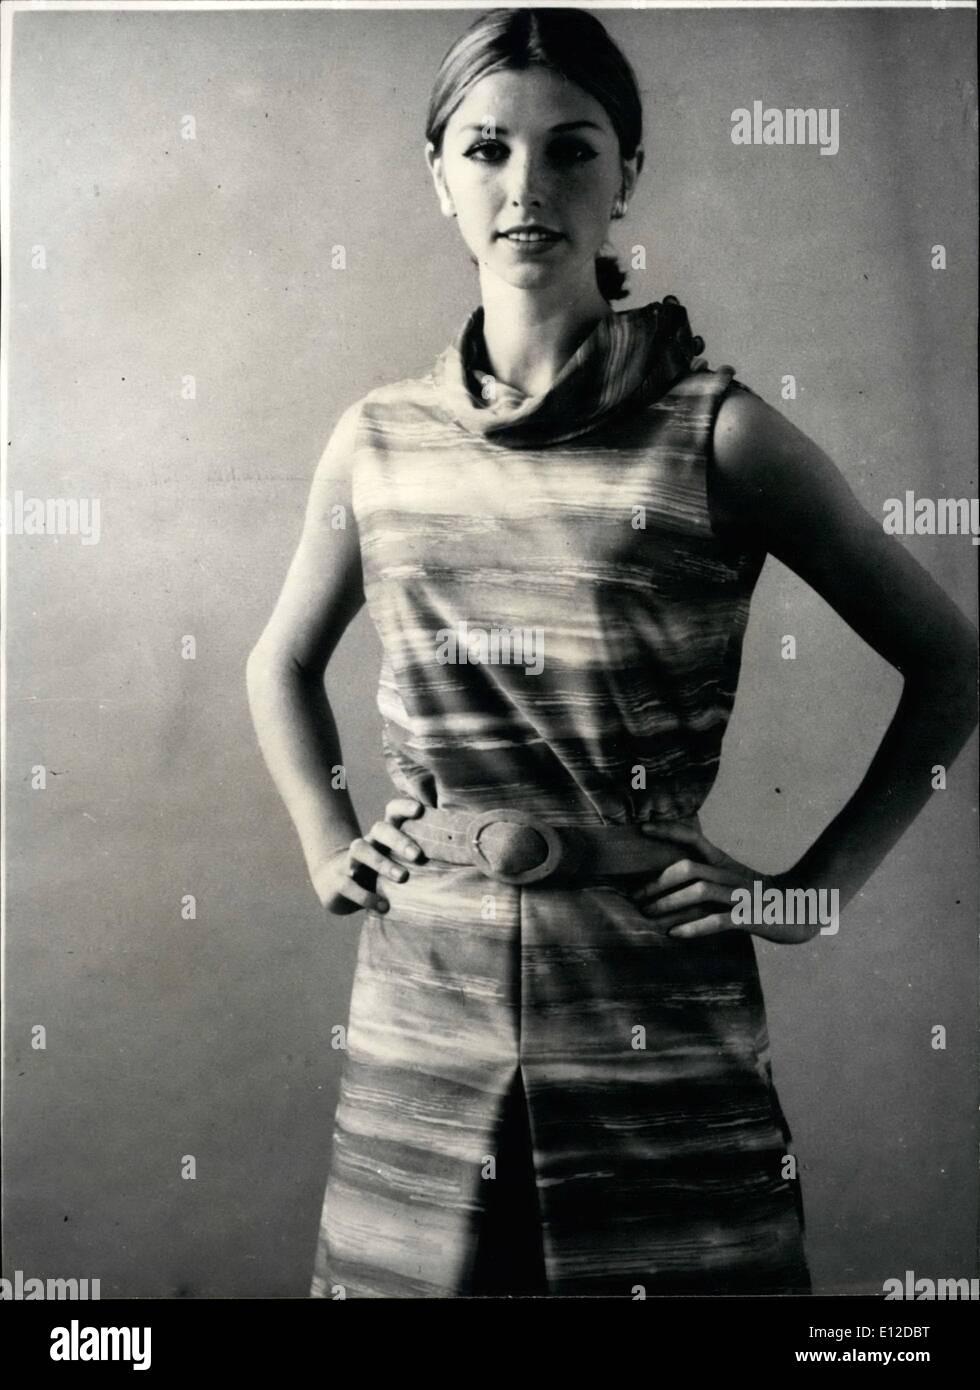 Dec. 19, 2011 - New Line 1965. OPS: Jersey dress with skirt looking like trousers designed by Paris dressmaker Wyler for summer 1965. NPM: Robe a effet de culotte Rhonel, en jersey Valfleurie creee par Wyler. Keystone - Stock Image